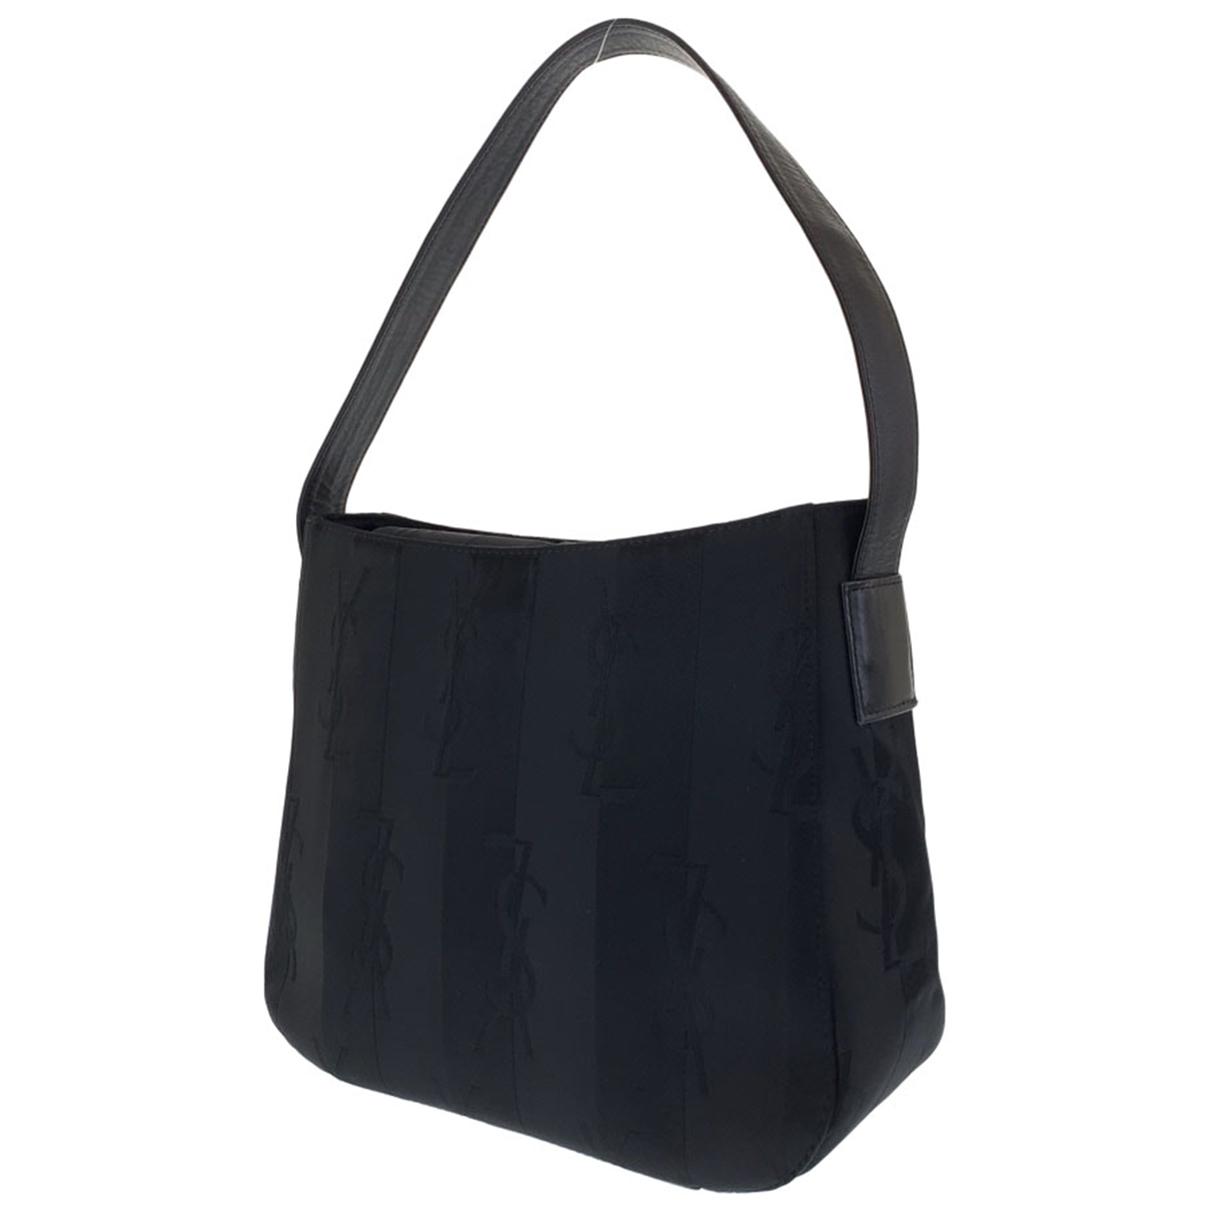 Yves Saint Laurent N Cloth handbag for Women N